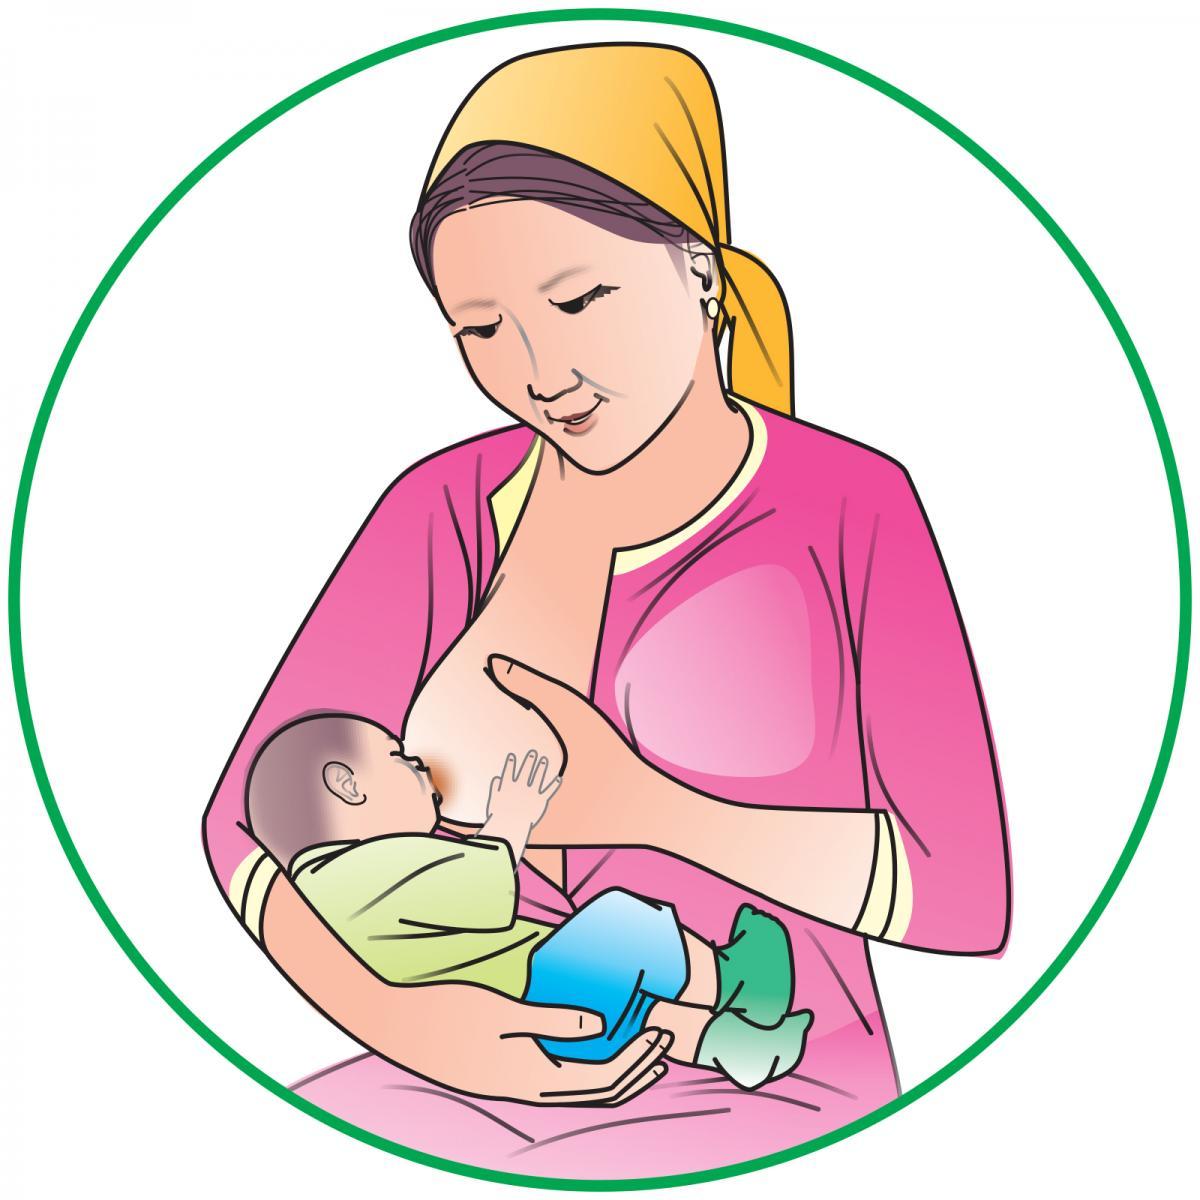 Breastfeeding - Breastfeeding 7-9mo 7-9mo - 03 - Kyrgyz Republic